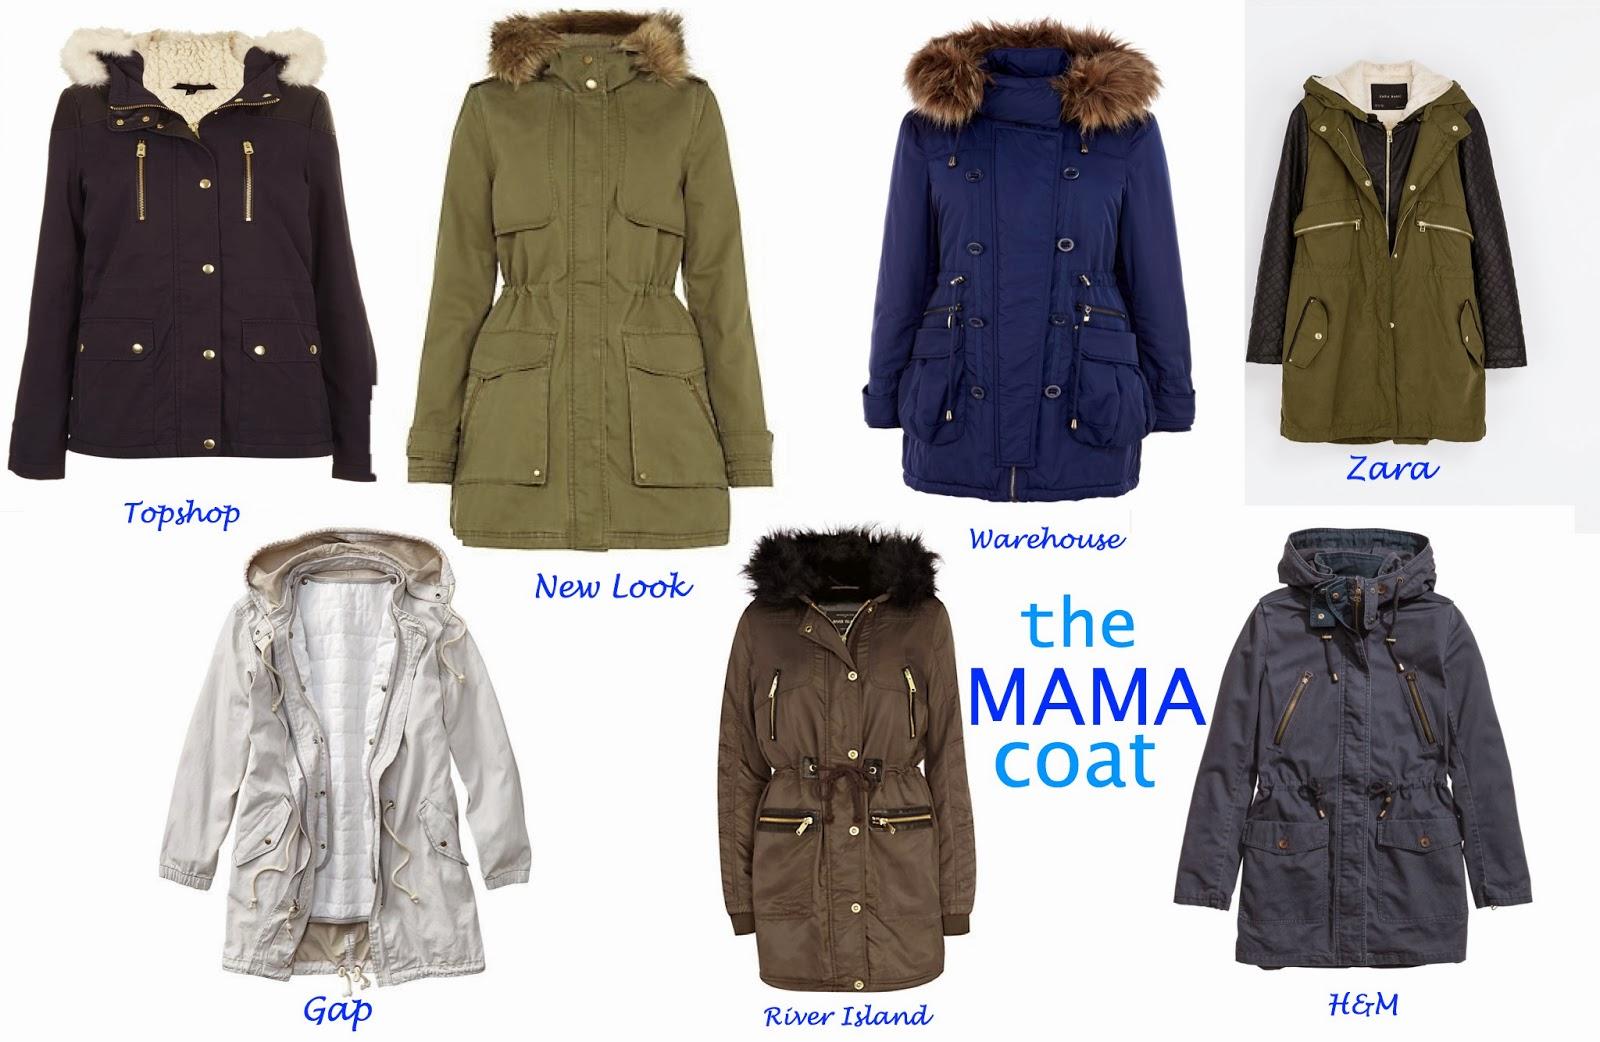 V. I. BUYS   The coat that all stylish mamas are wearing   Parka coats   the mama uniform   practical coats for new mums   style   fashion for mums   coats   mamasVIB